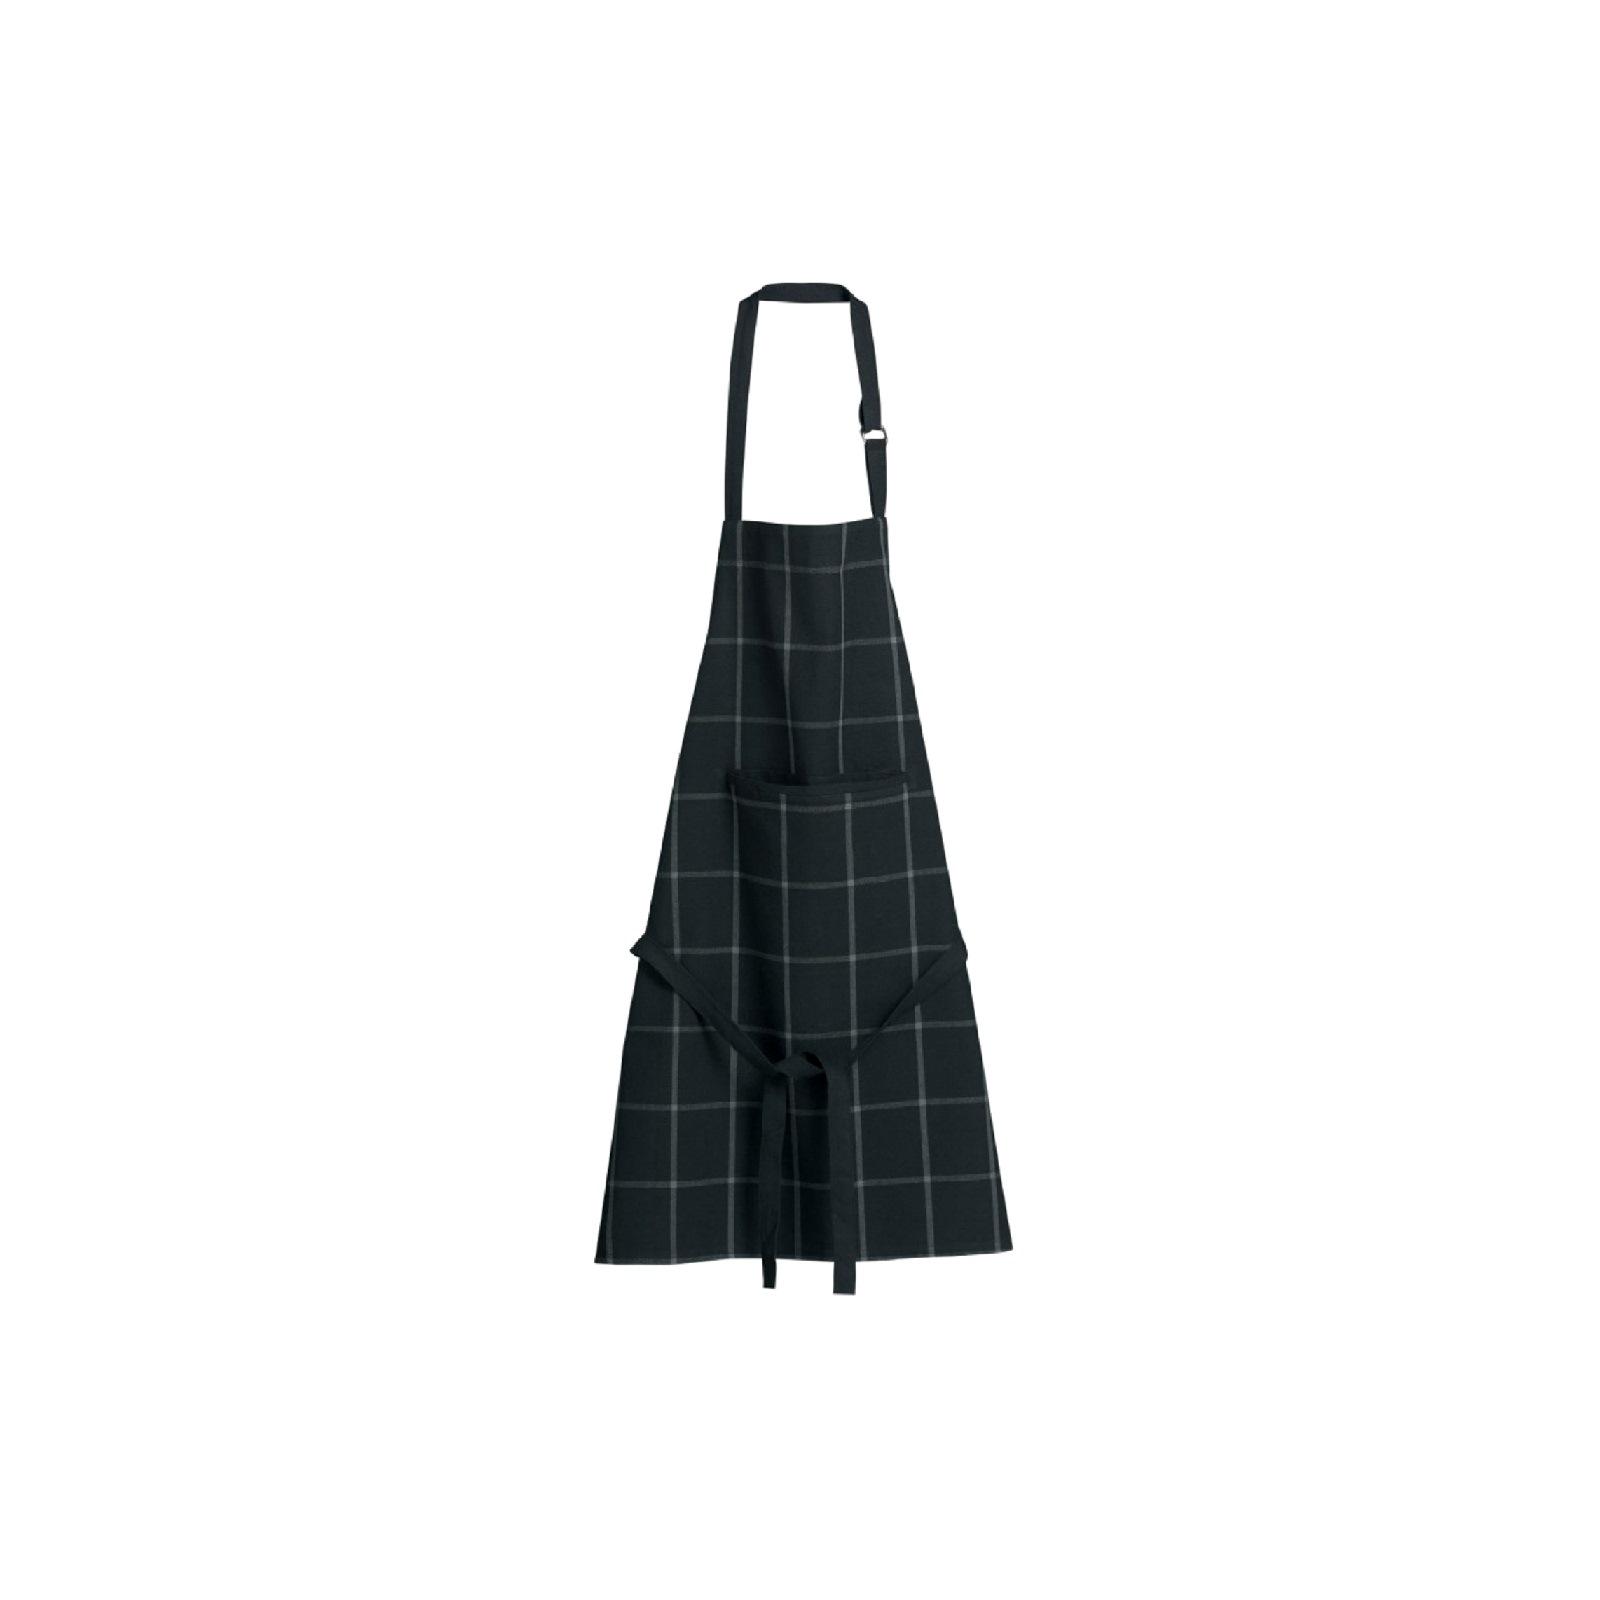 Фартук Winkler DOHA, размеры 80 х 85 см, черный Winkler 3720079000 фото 1